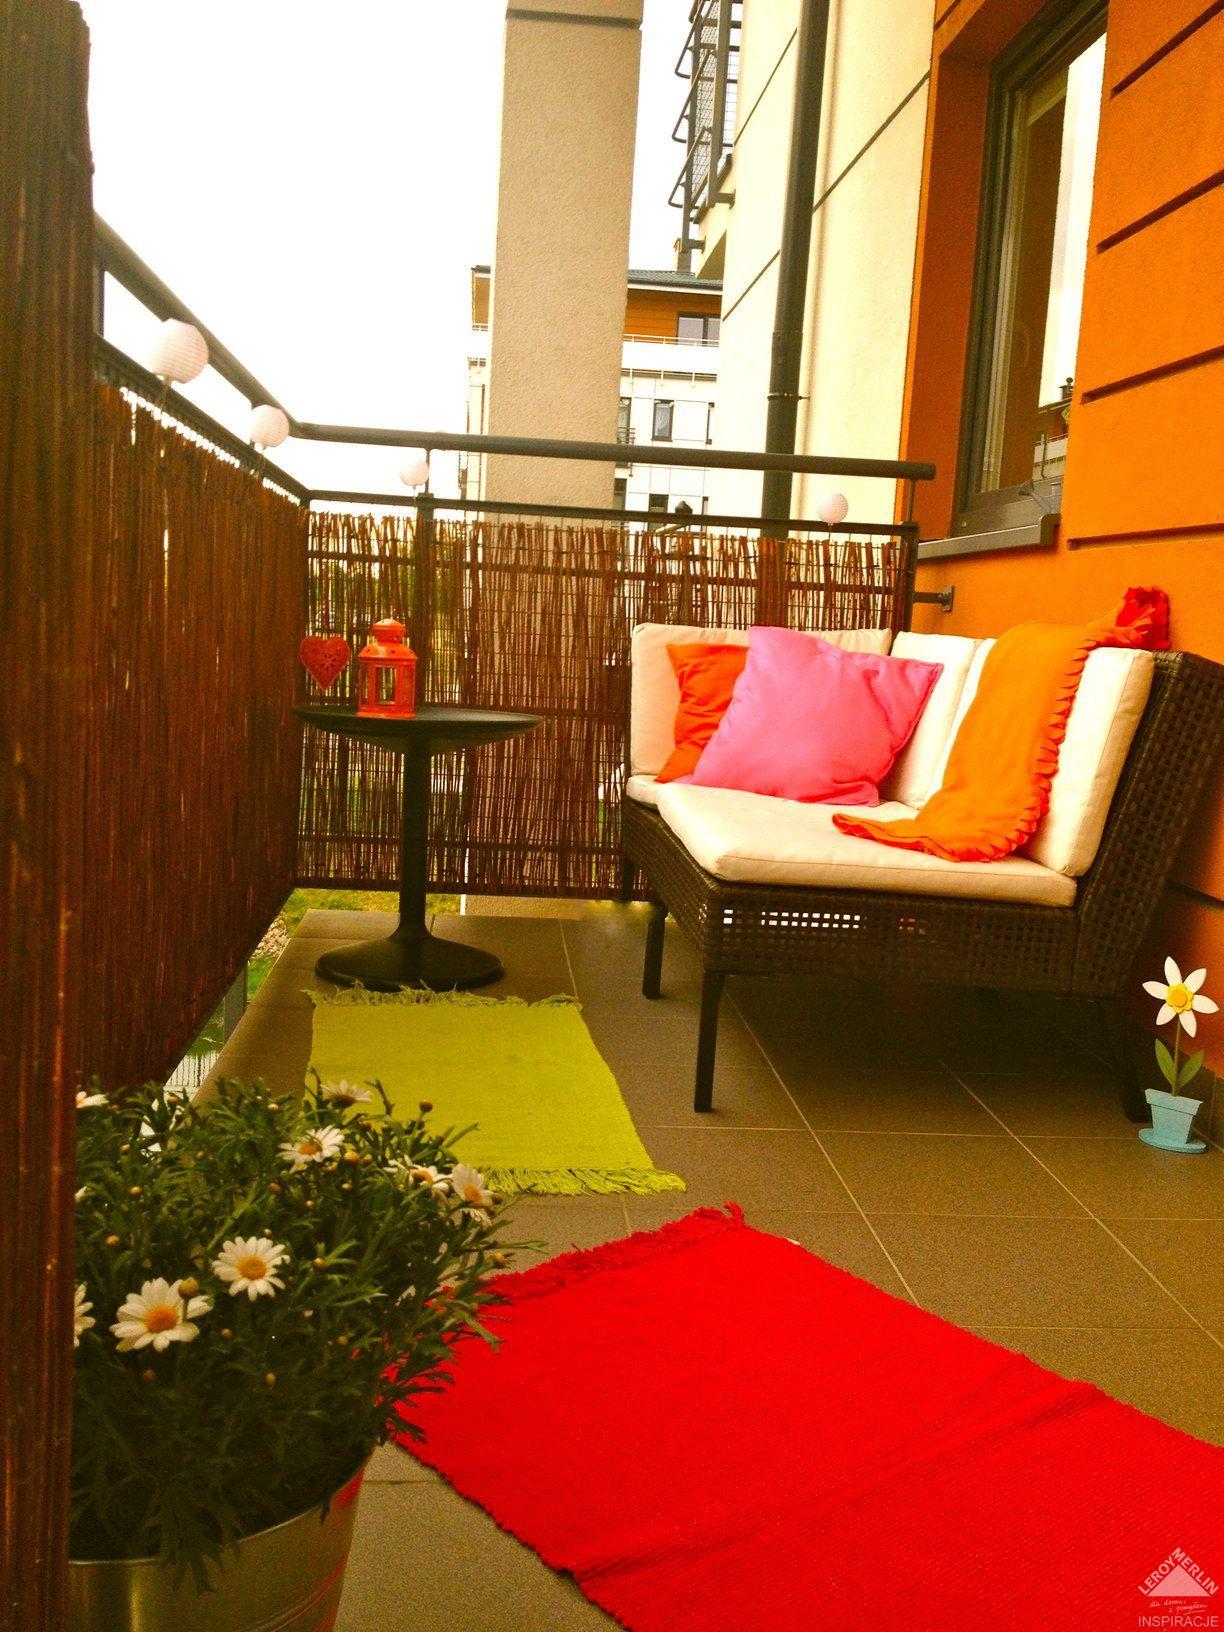 Maly Balkon Ogrod Wasze Wnetrza Leroy Merlin Outdoor Sofa Decor Outdoor Decor